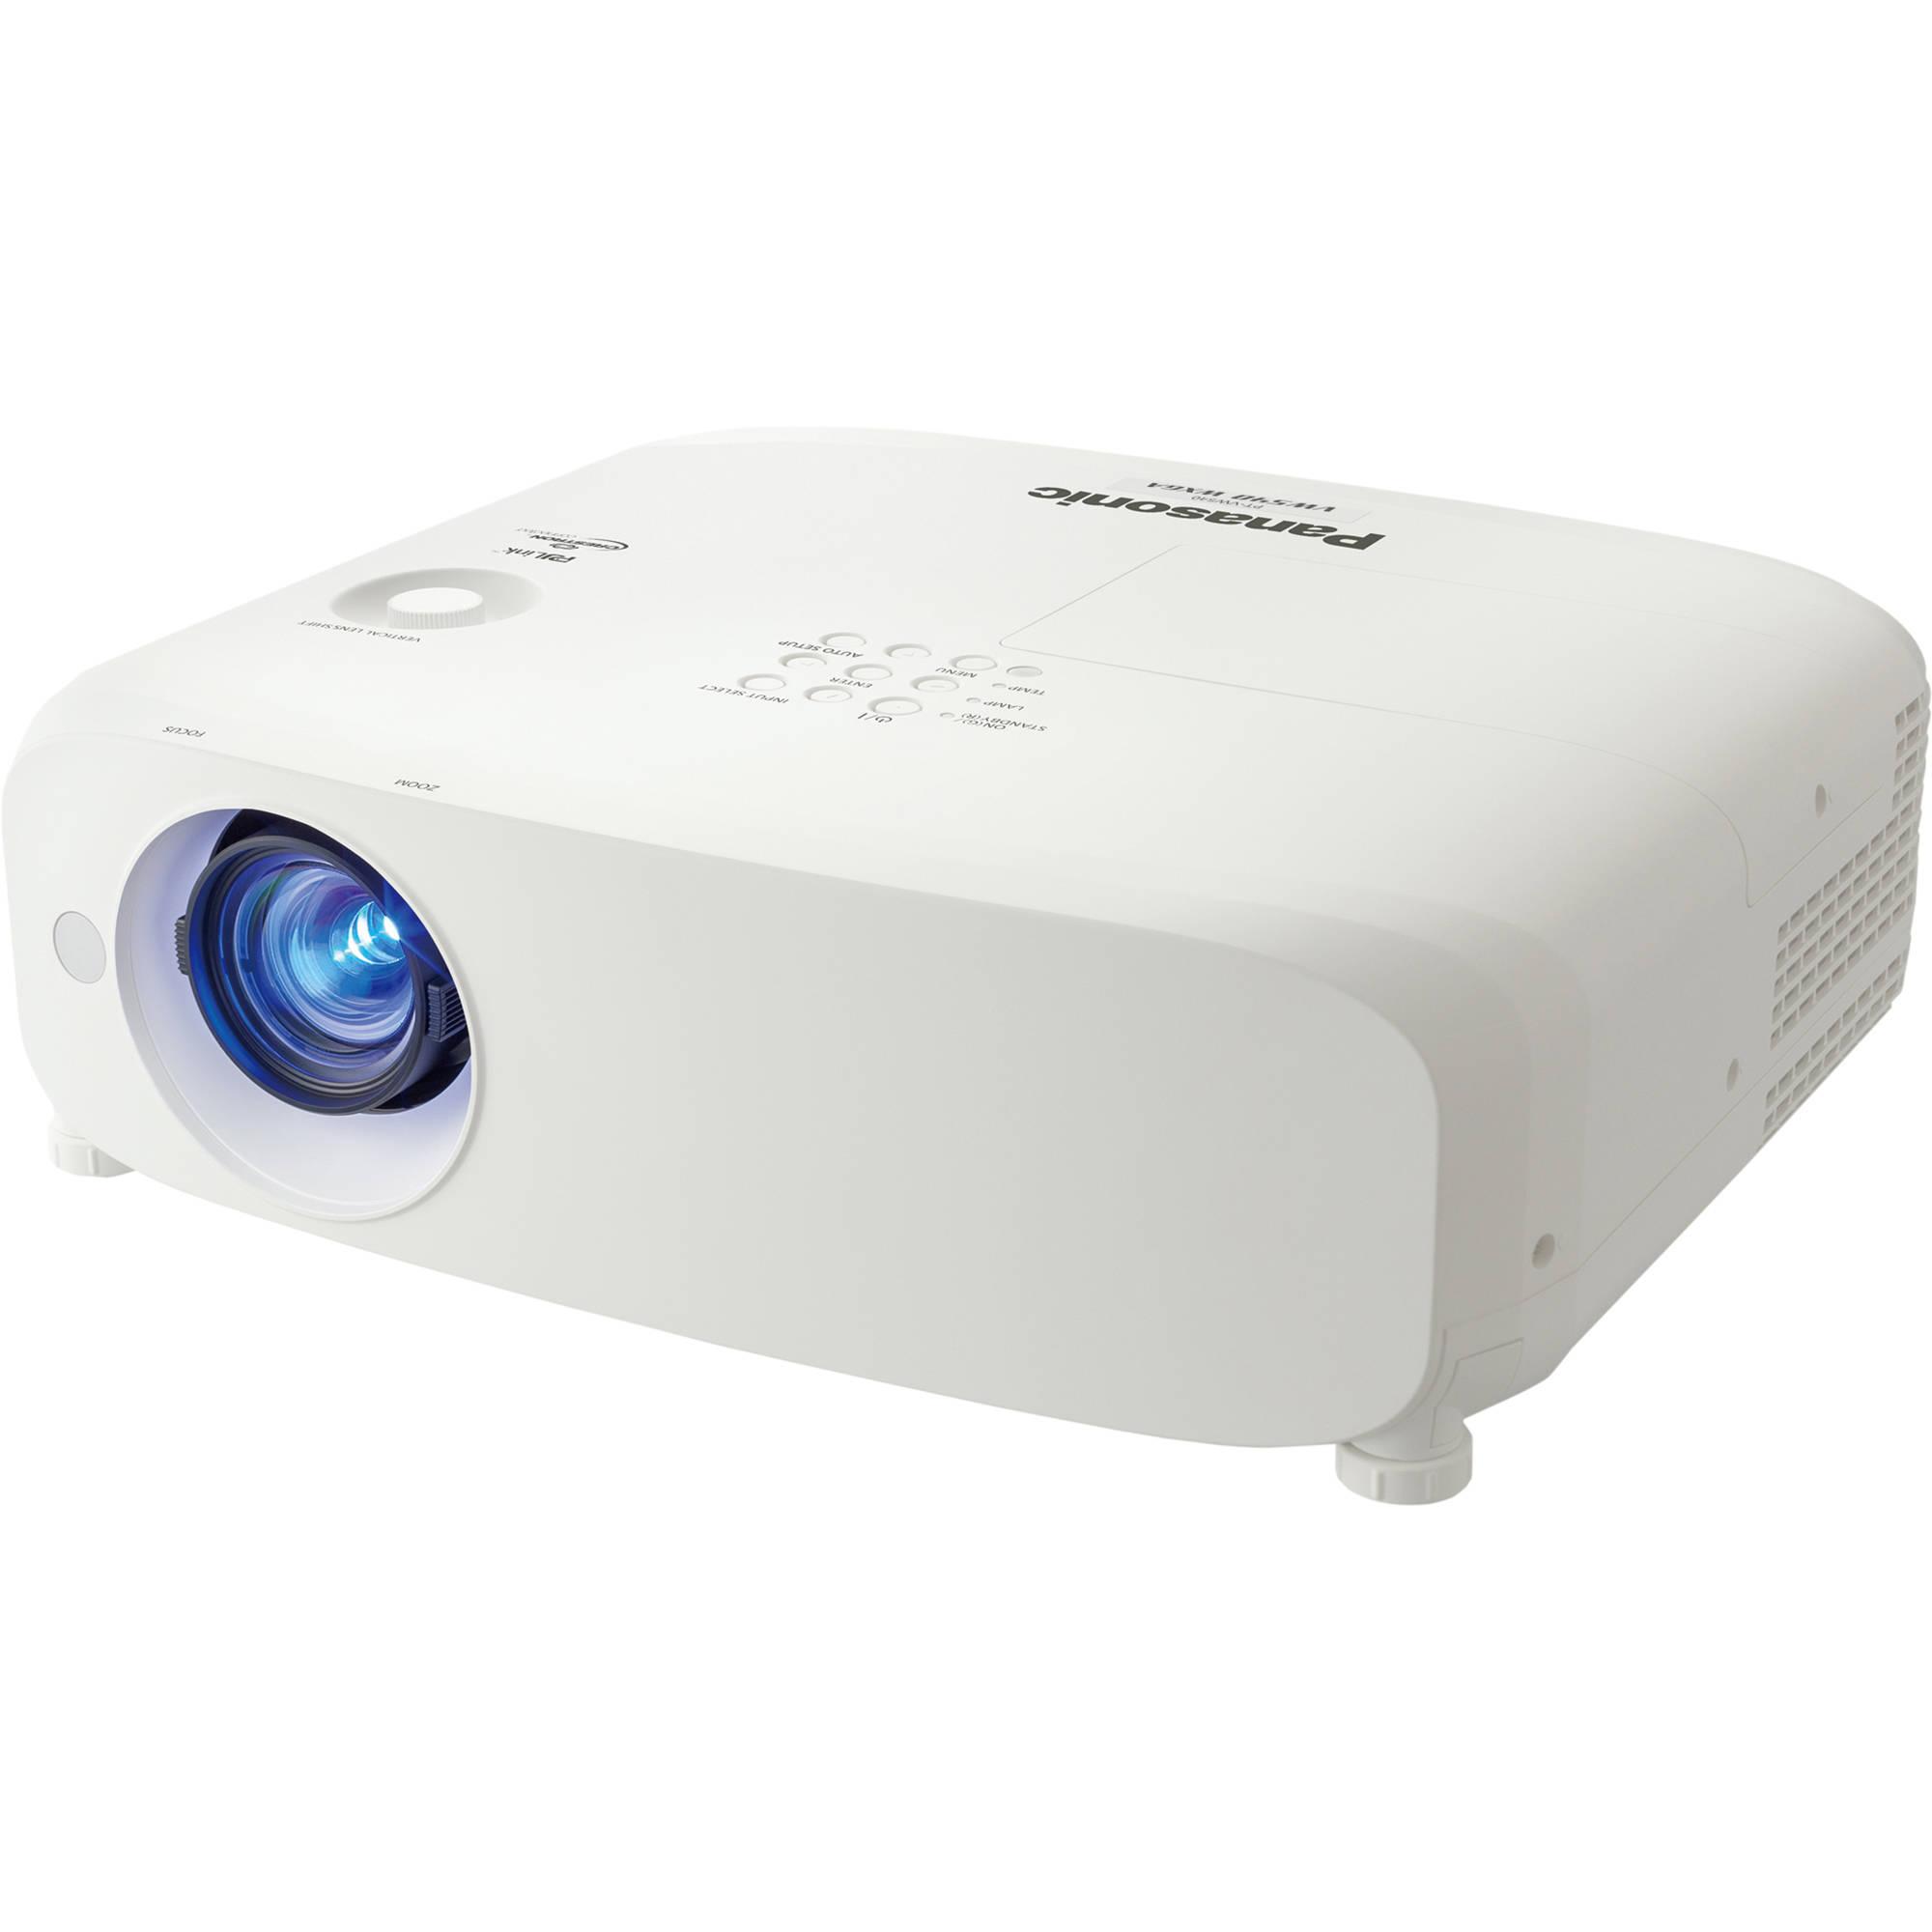 panasonic pt vw540u 5500 lumen wxga 3lcd projector pt vw540u b h rh bhphotovideo com Panasonic Cordless Phone KX-TG155SK User Manual Panasonic TV Manual